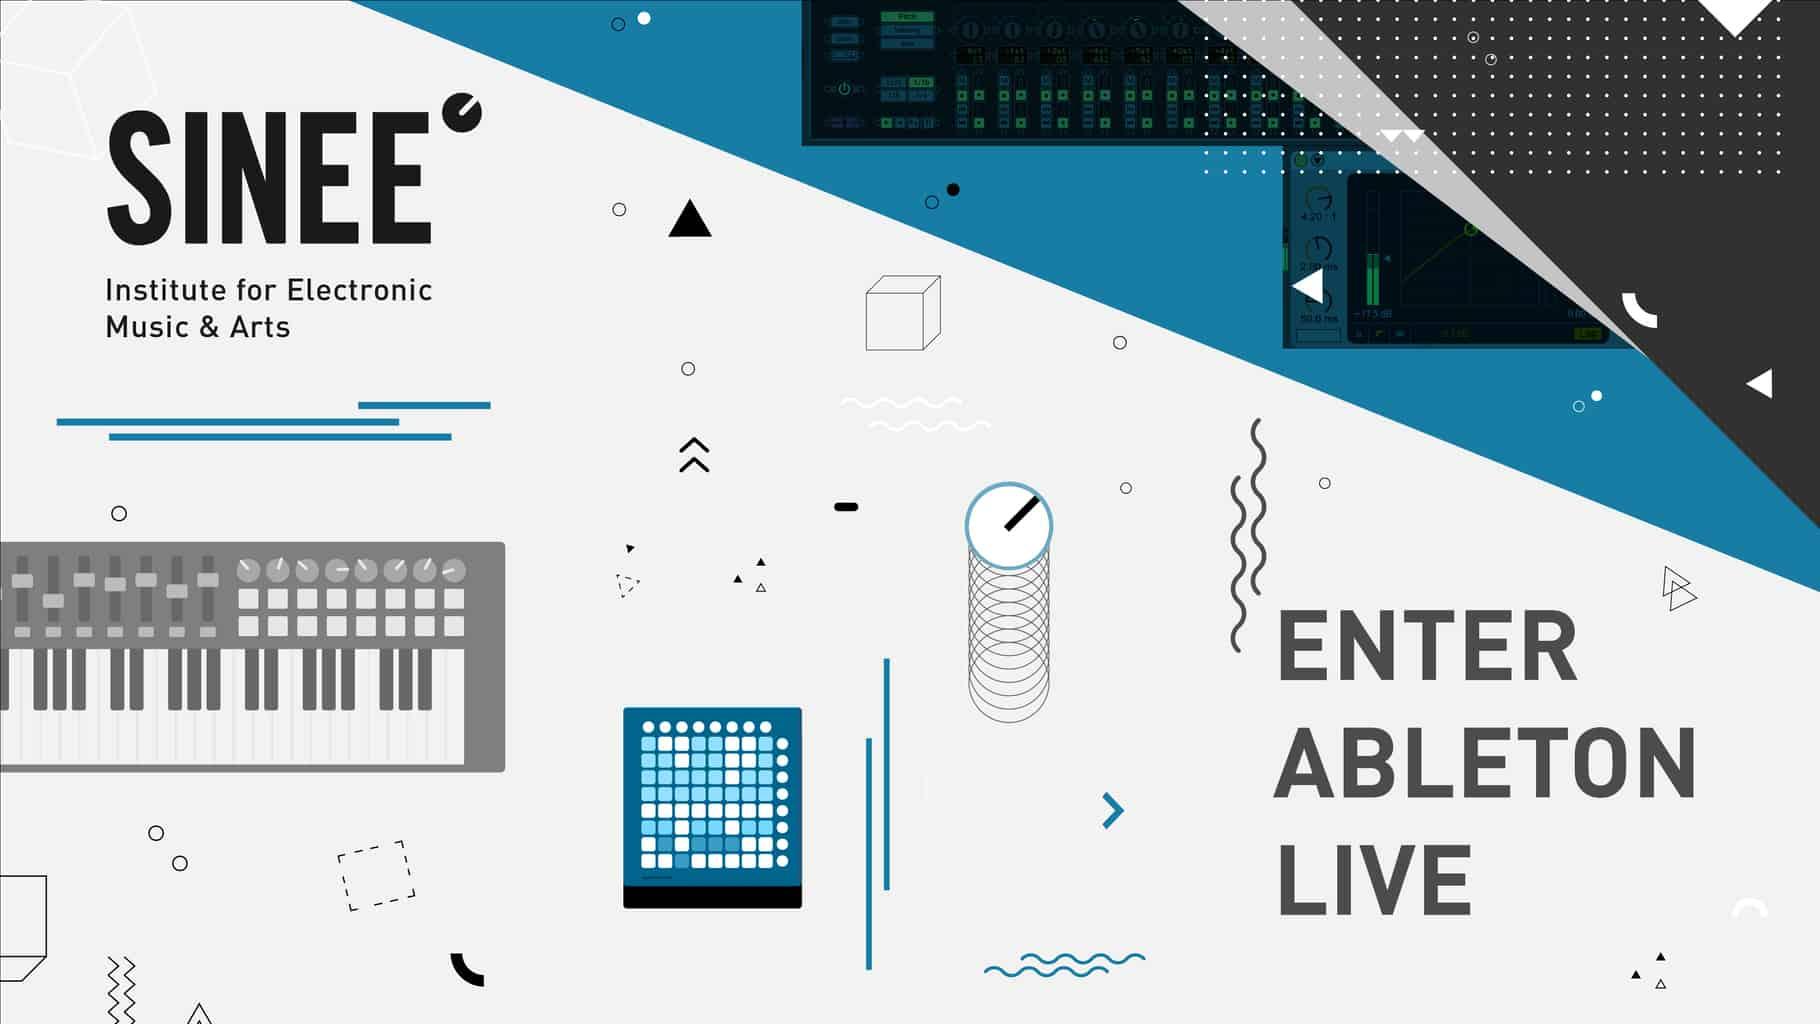 Enter Ableton Live